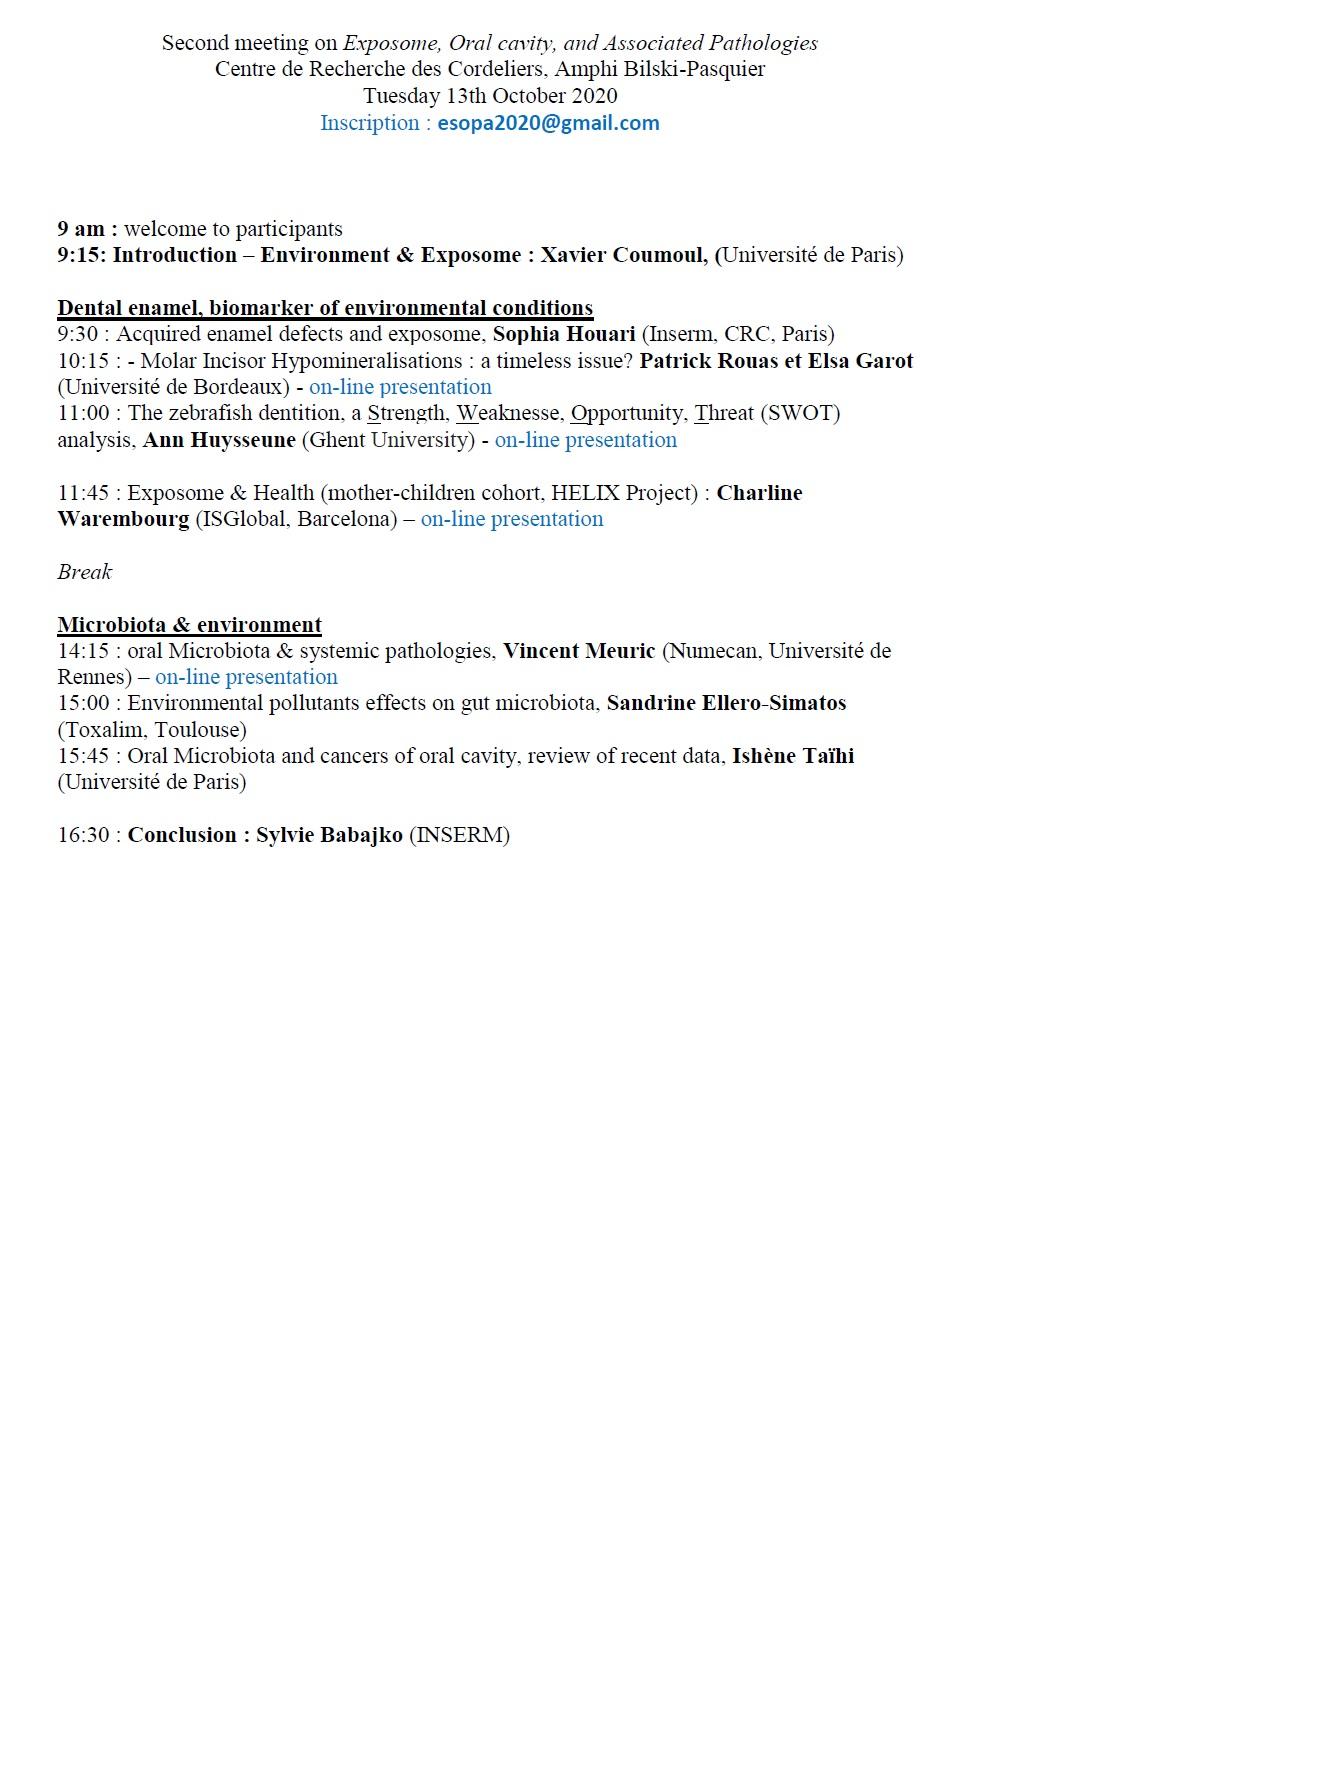 Exposome, oral cavity, associated pathologies   Tuesday, October 13, 2020